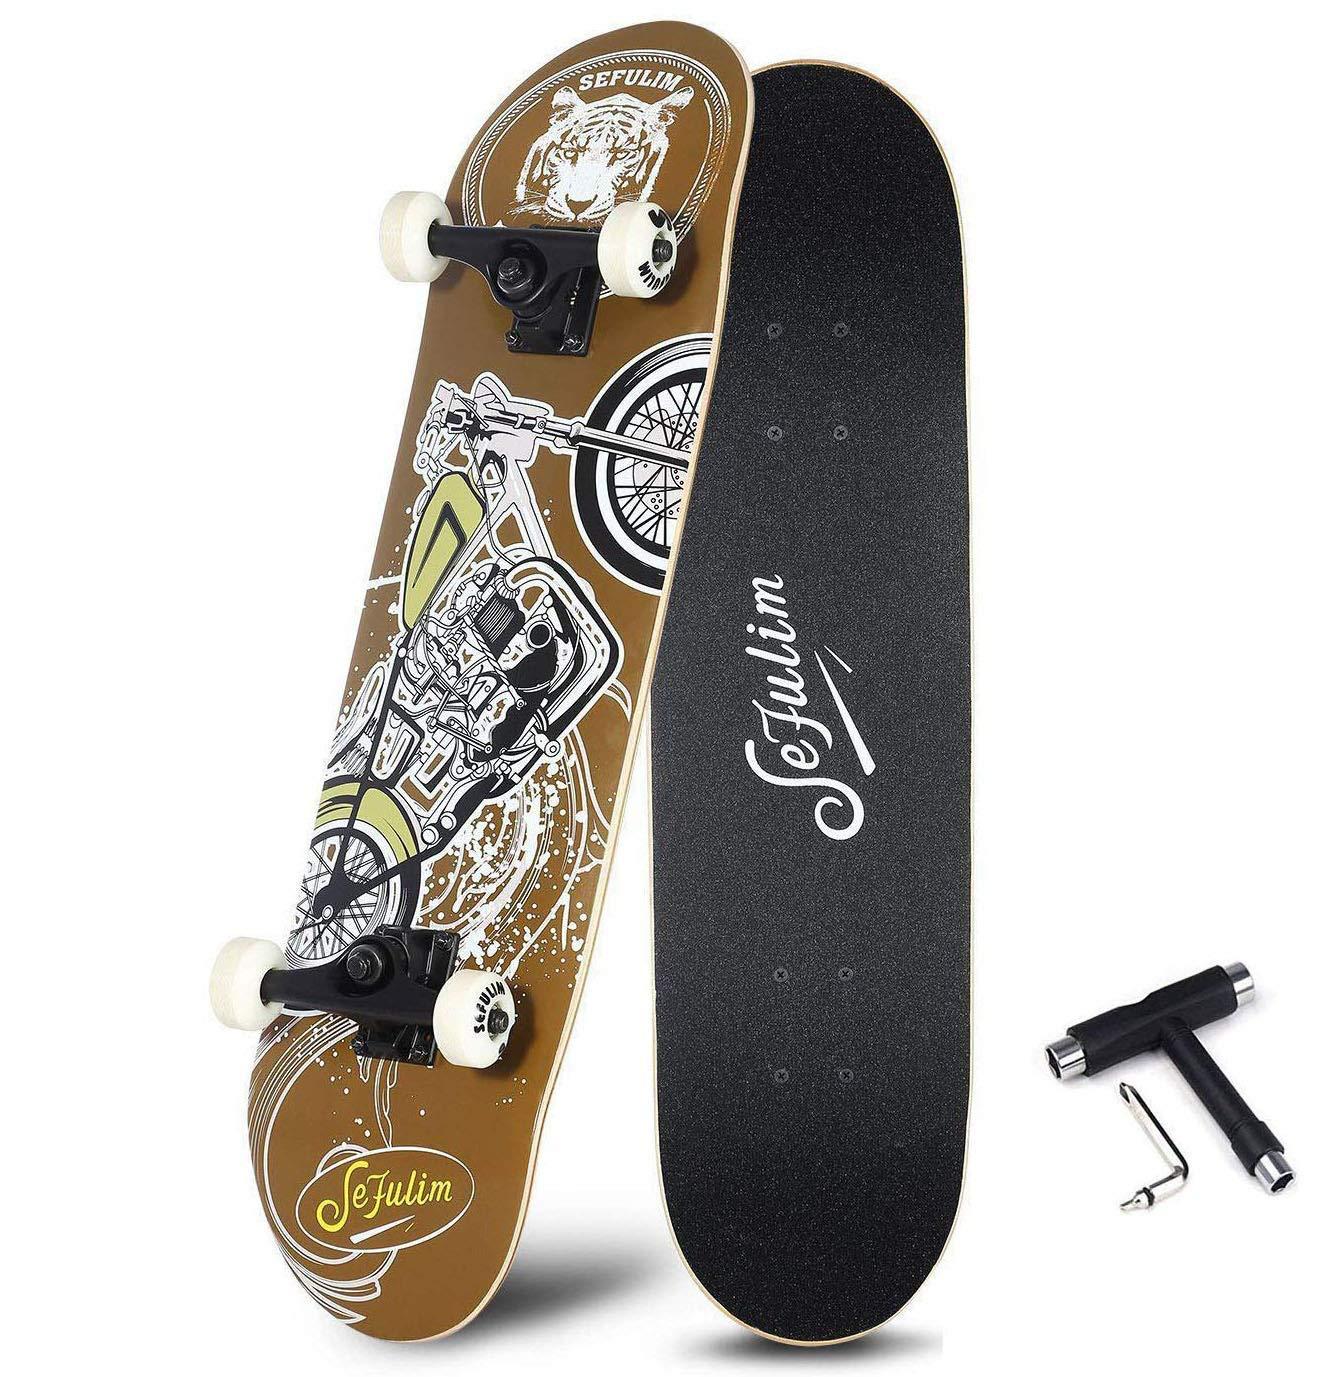 Sefulim 31''x8'' Complete Skull Skateboards Outdoor Street Concave Skateboard Gifts Double Kick Penny Skateboard for Kids Boys Beginners Girls (Motorcycle Pattern)